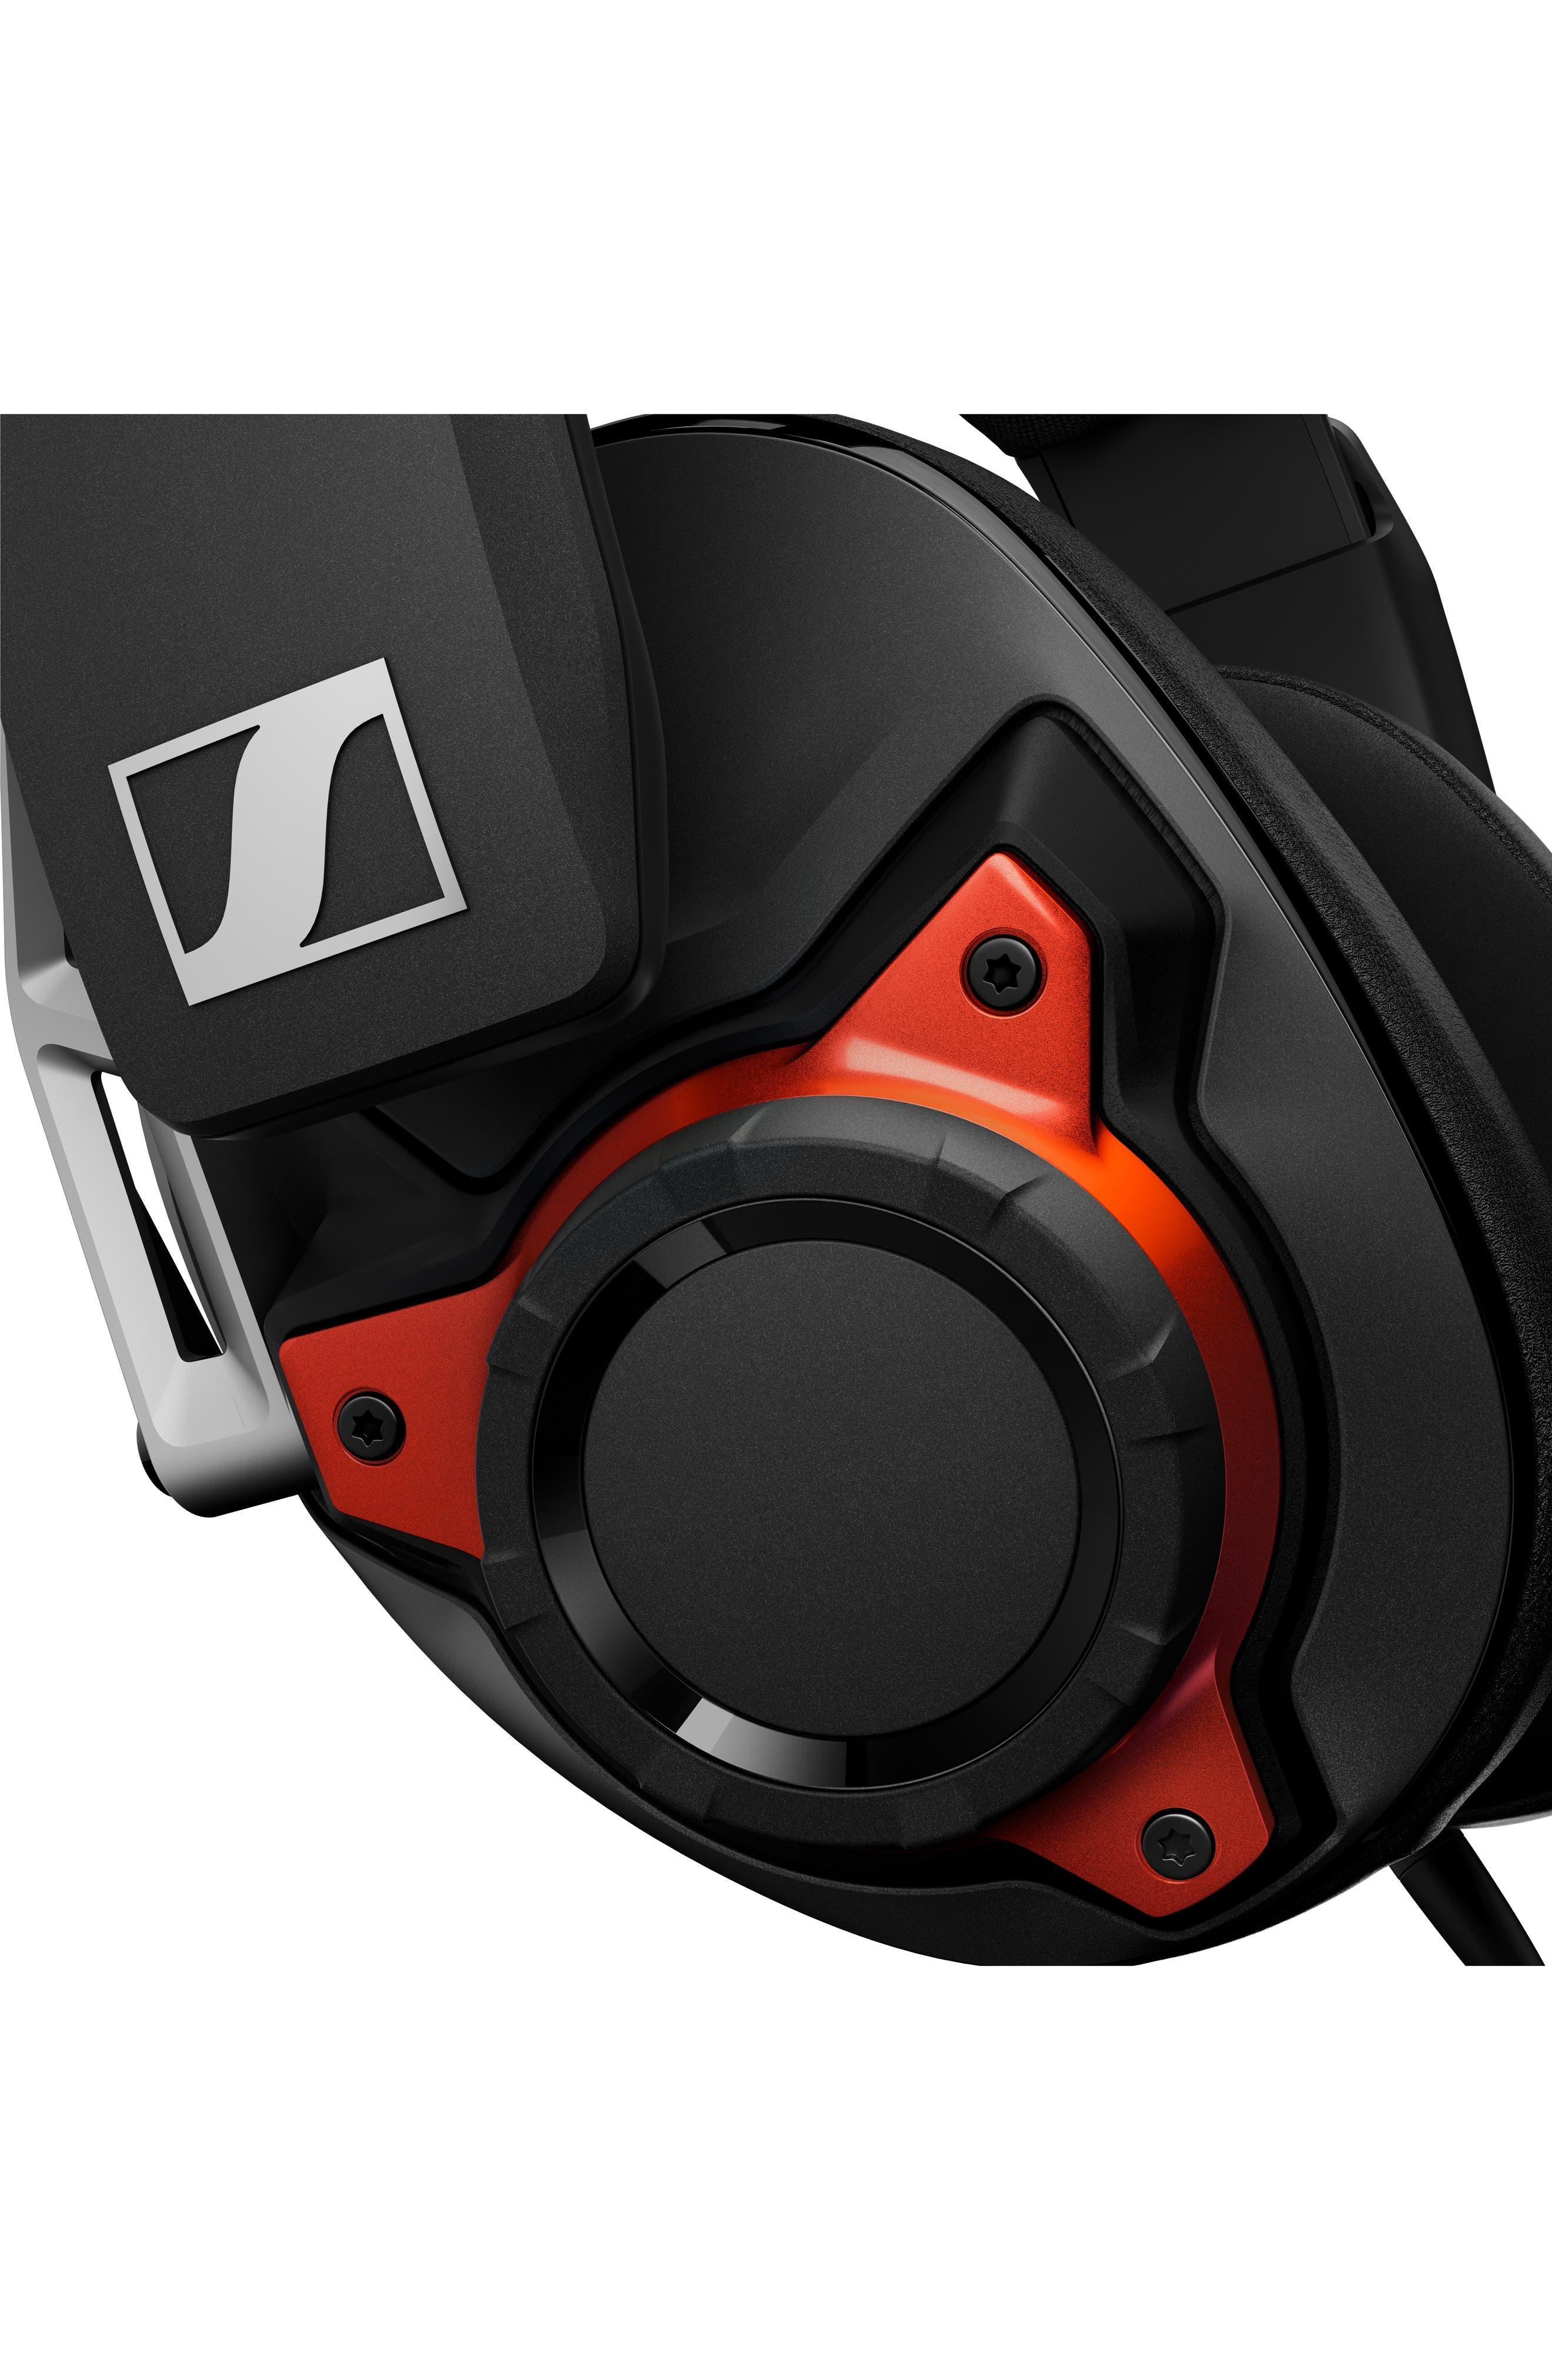 GSP 600 Noise Cancelling Gaming Headset,                             Alternate thumbnail 7, color,                             BLACK/ ORANGE